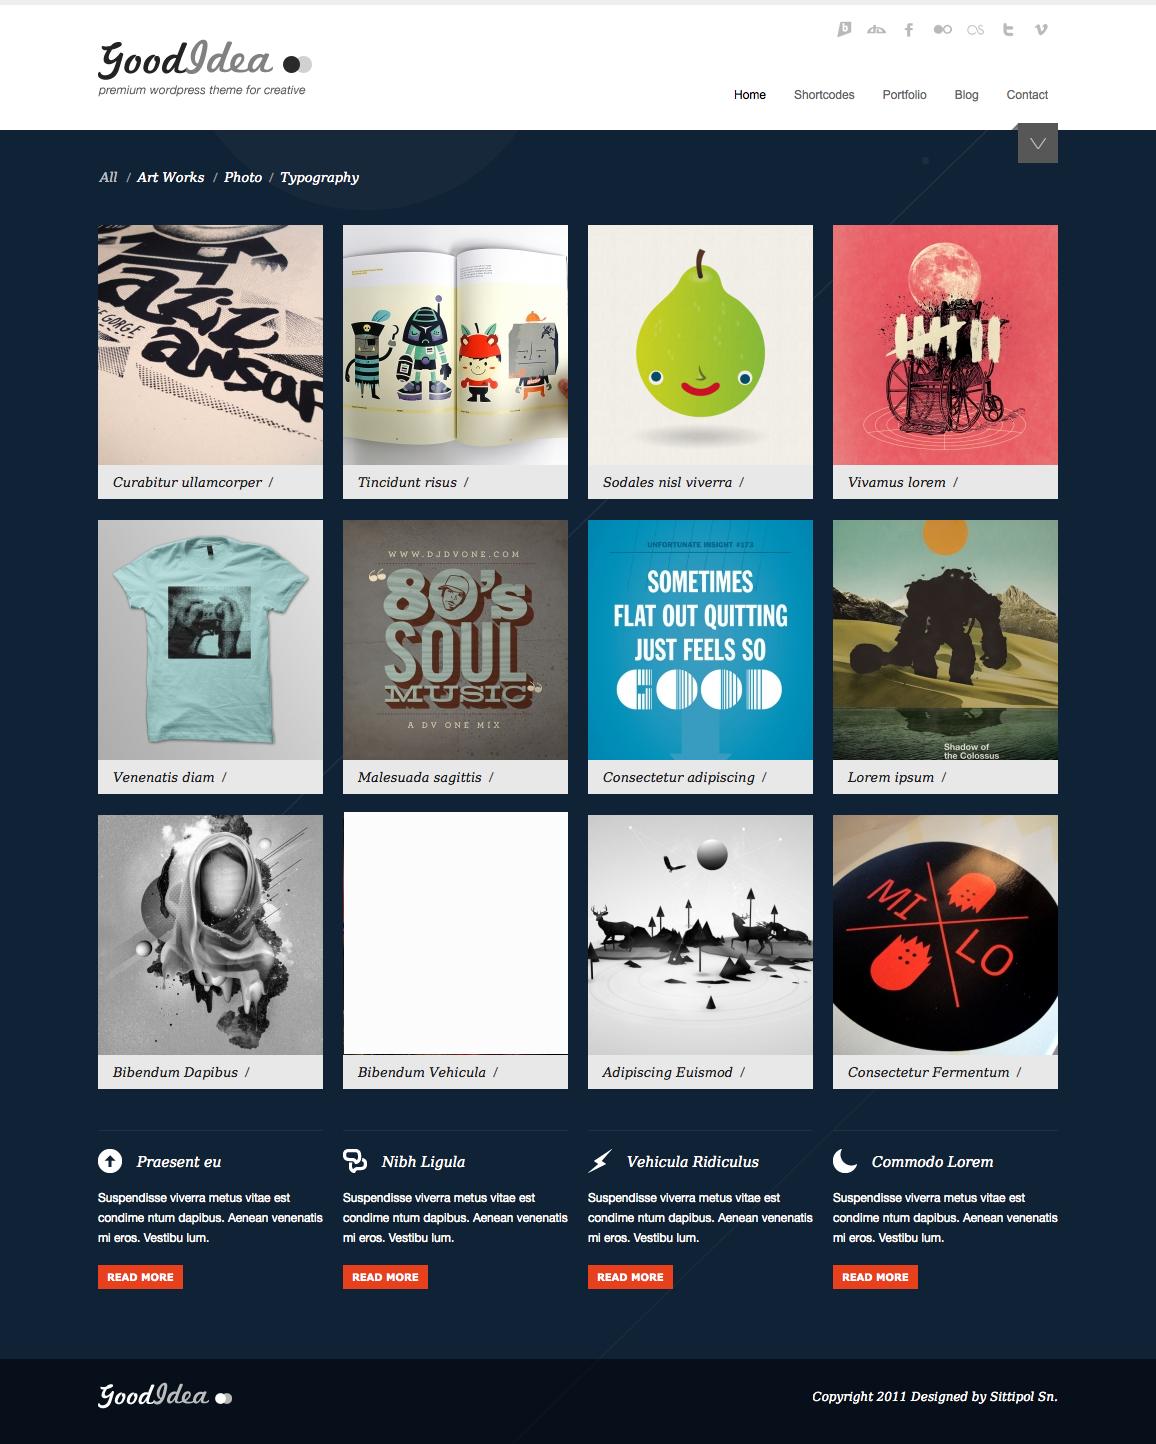 Goodidea - creative wordpress theme - homepage with blue dark